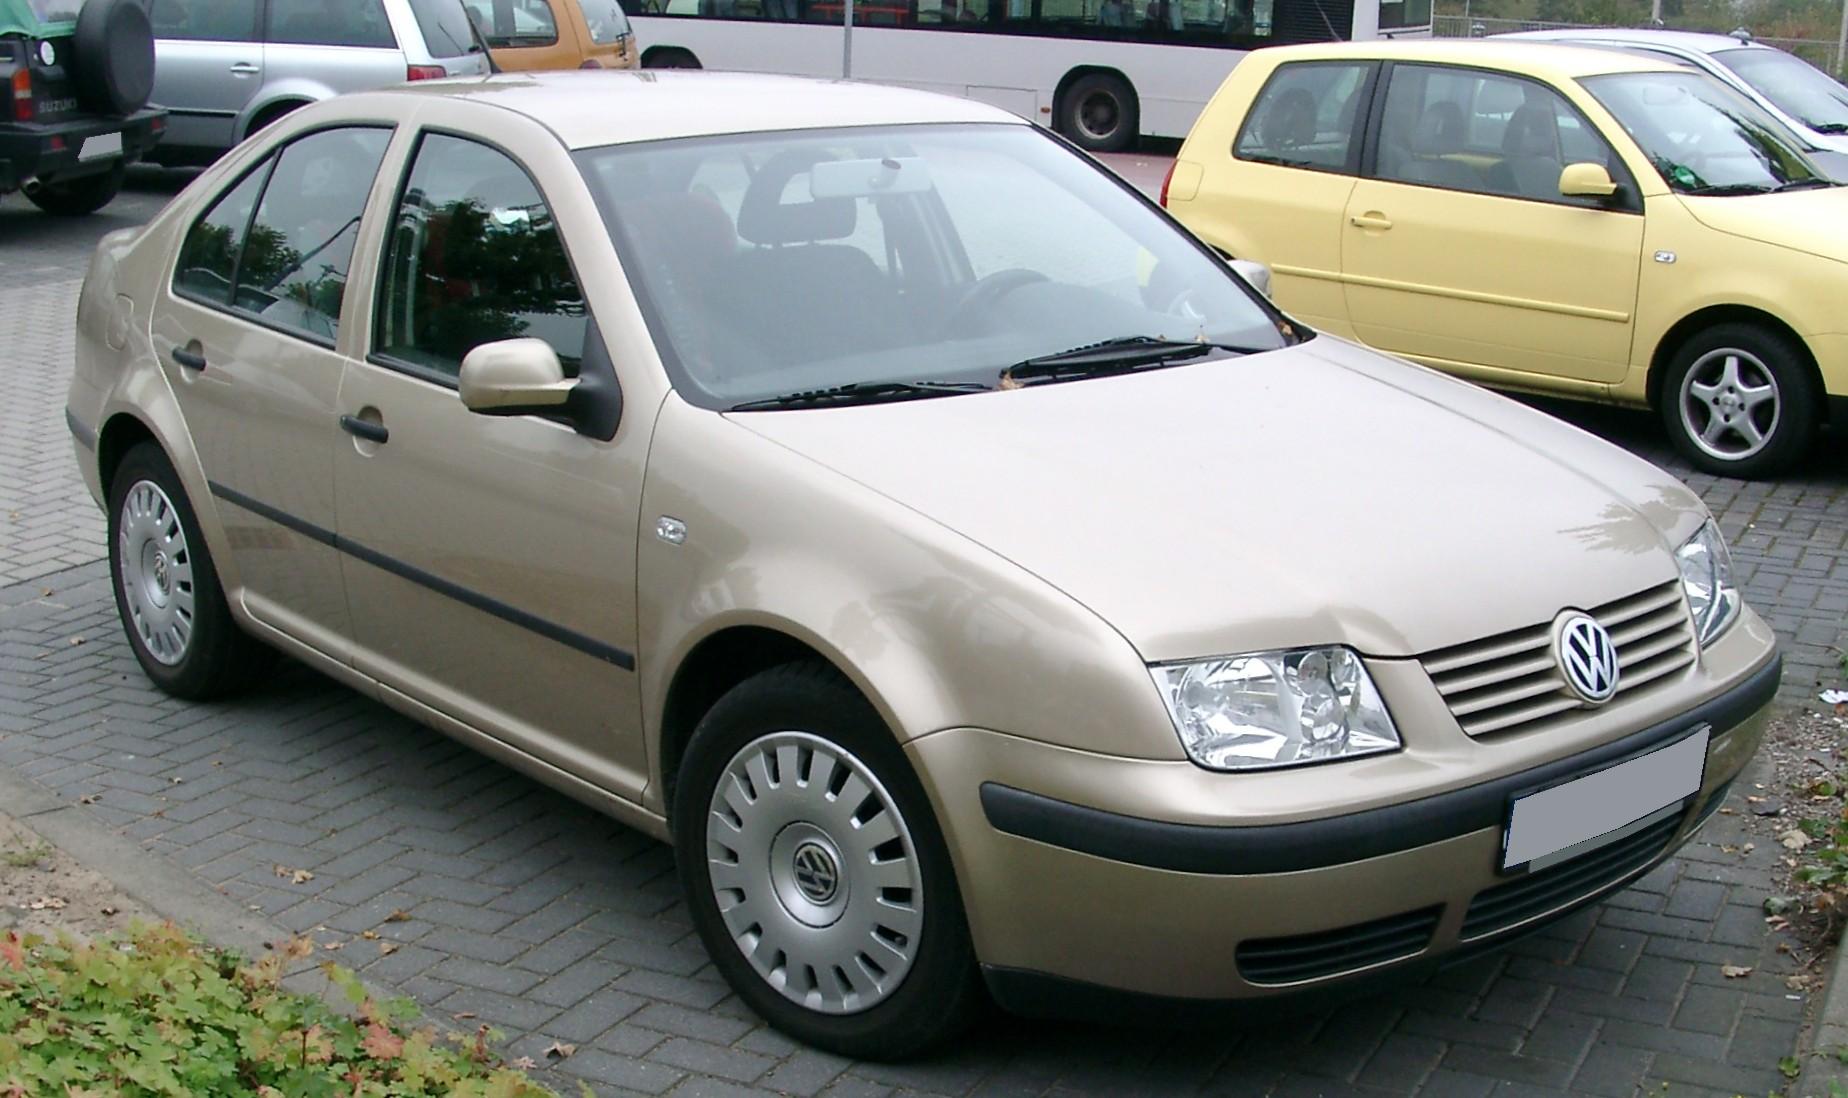 Volkswagen Bora Simple English Wikipedia The Free Encyclopedia